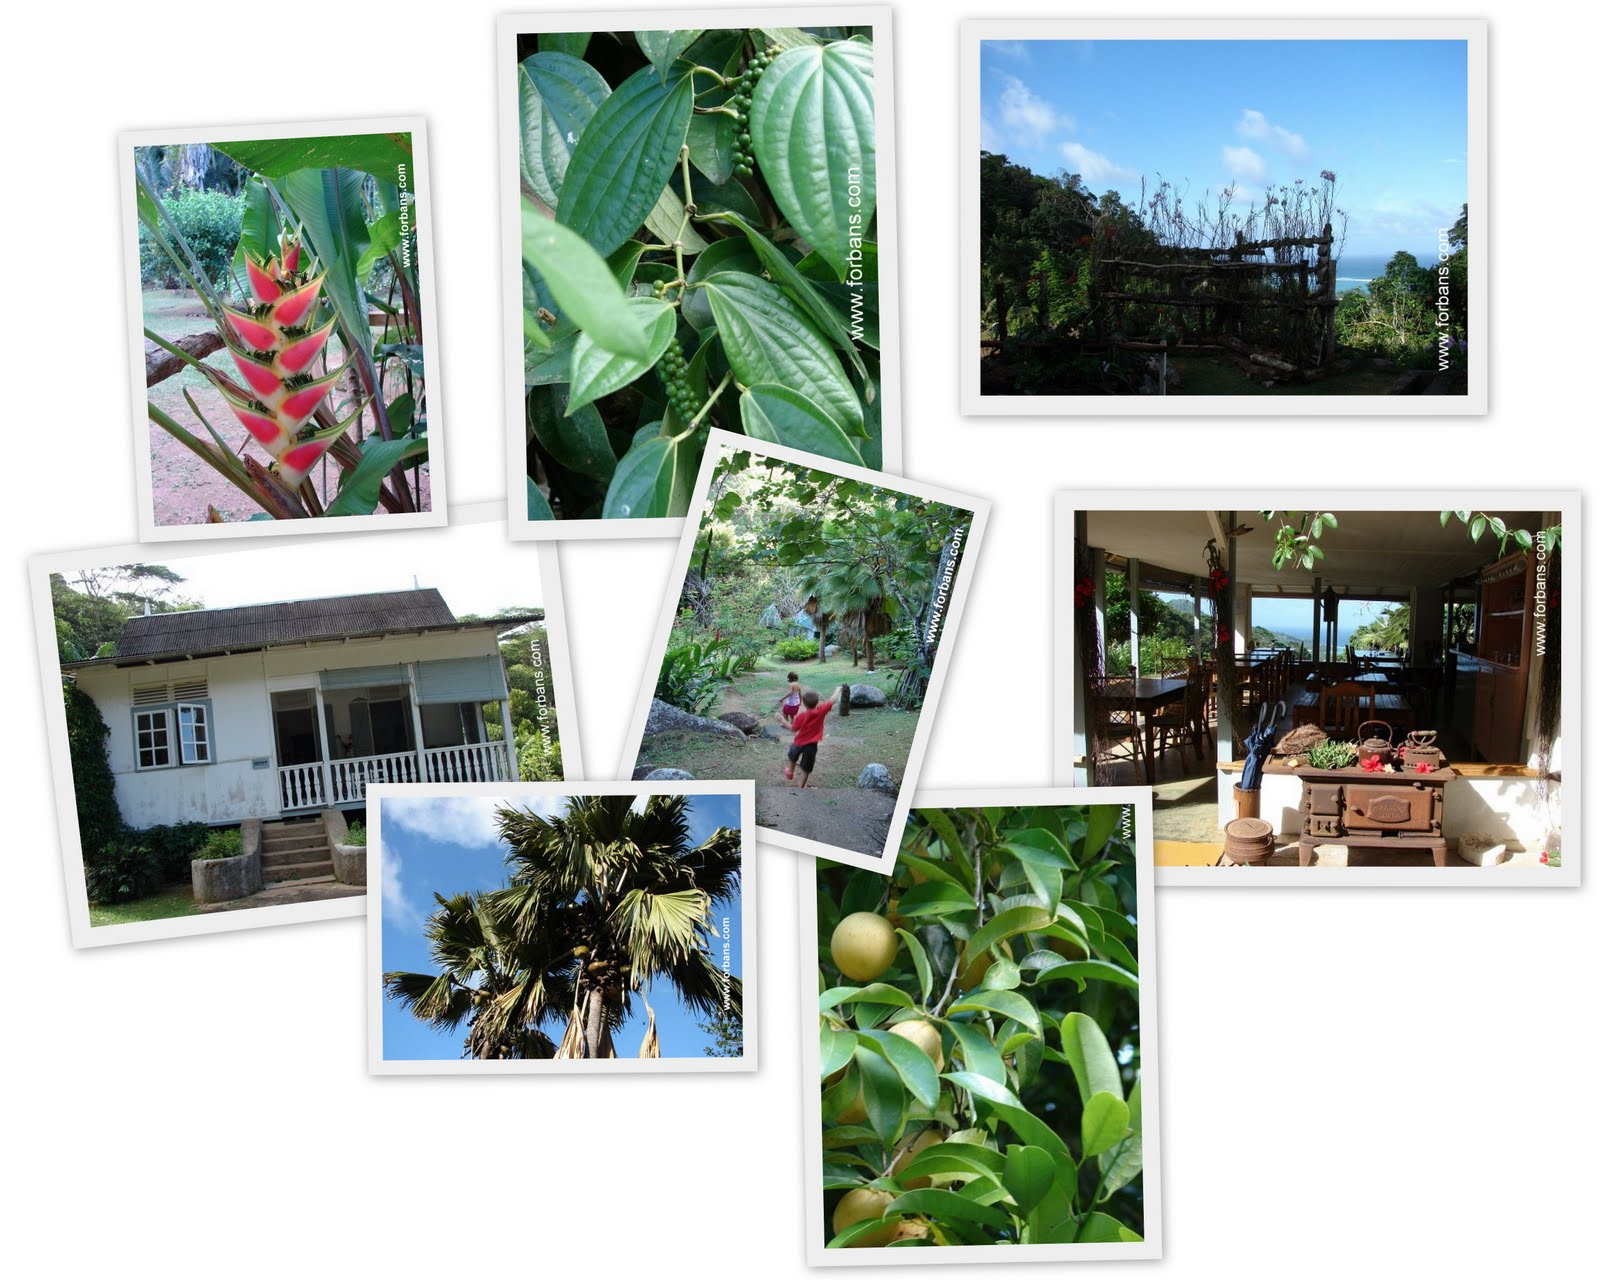 Jardin du roi anse royale seychelles seychelles for Villa jardin seychelles